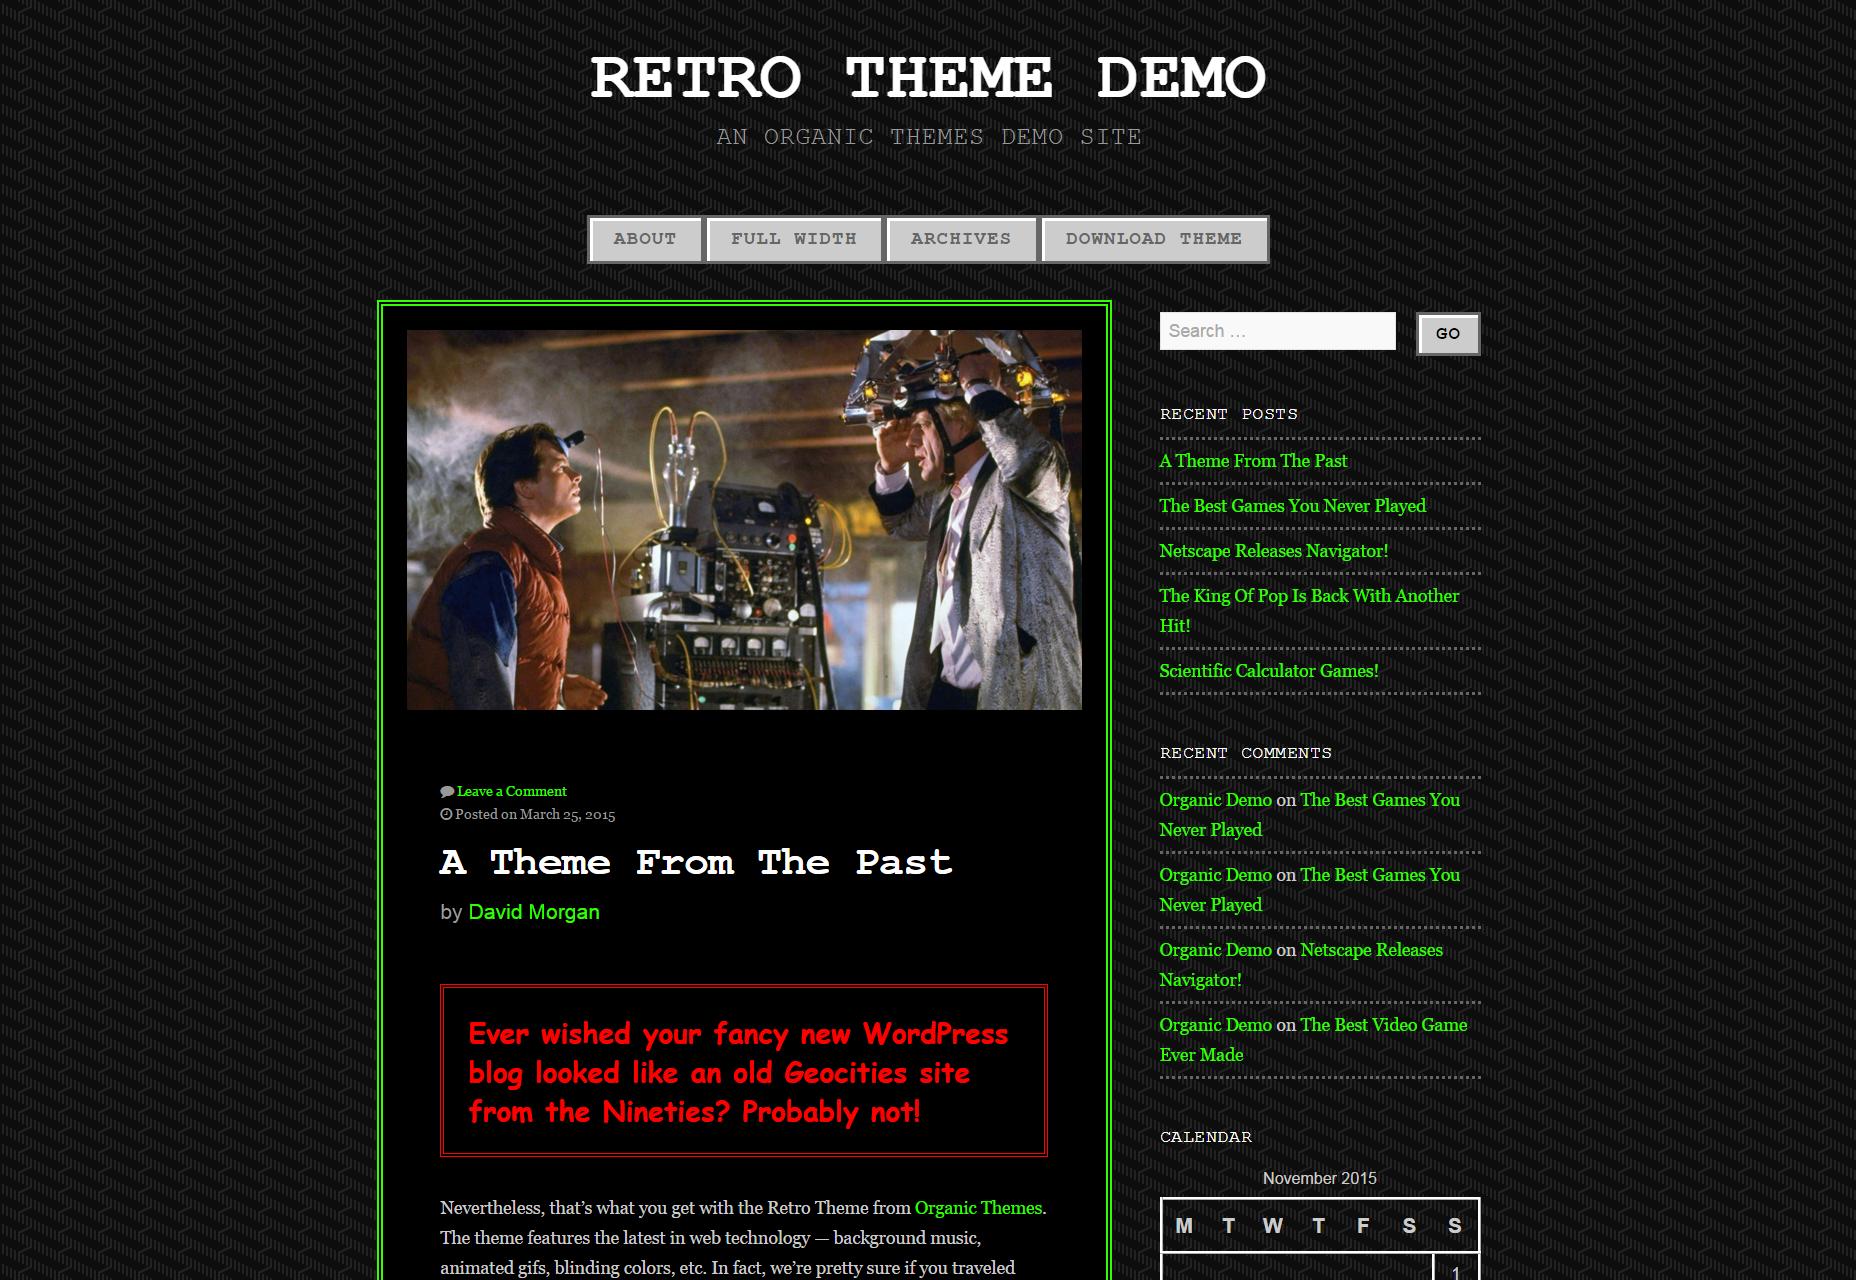 Tema retro: temas clásicos de WordPress inspirados en videojuegos